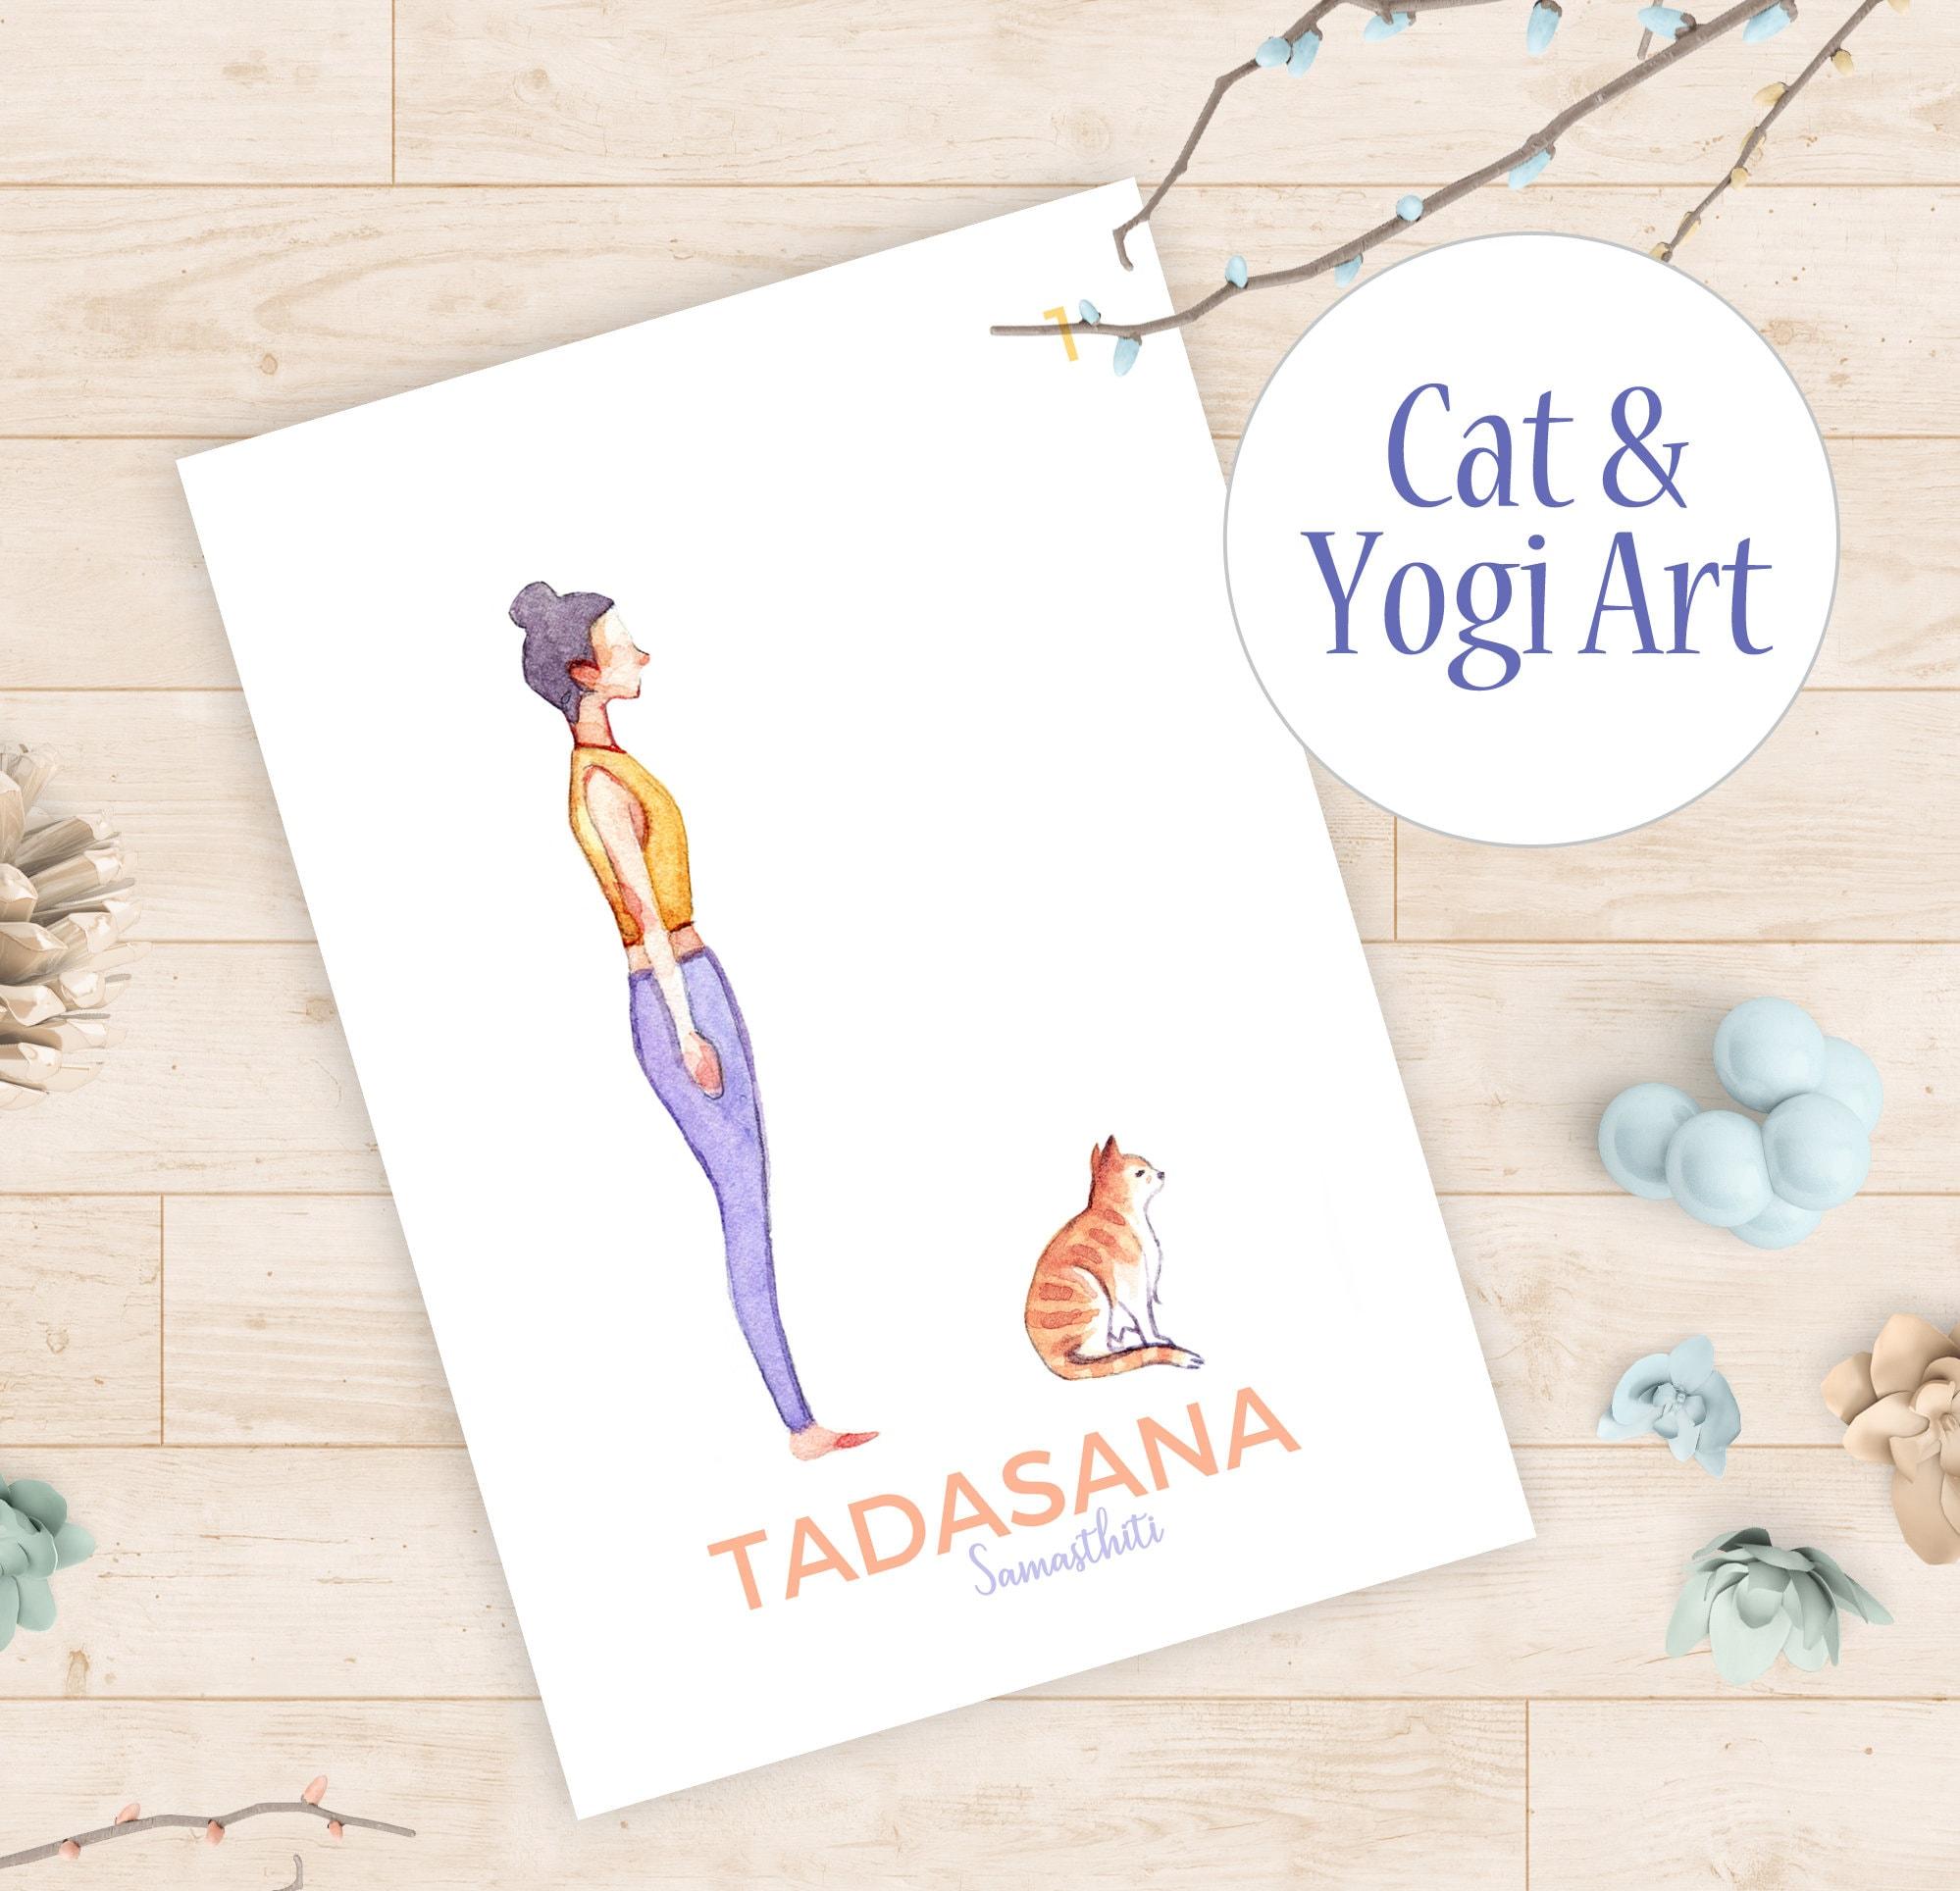 50 Yoga Cards   Sun Salutation A Printables   Yoga Poses Card Printable,  Asana Surya Namaskar, Ashtanga Sanskrit Yogi Gifts, Watercolor Art